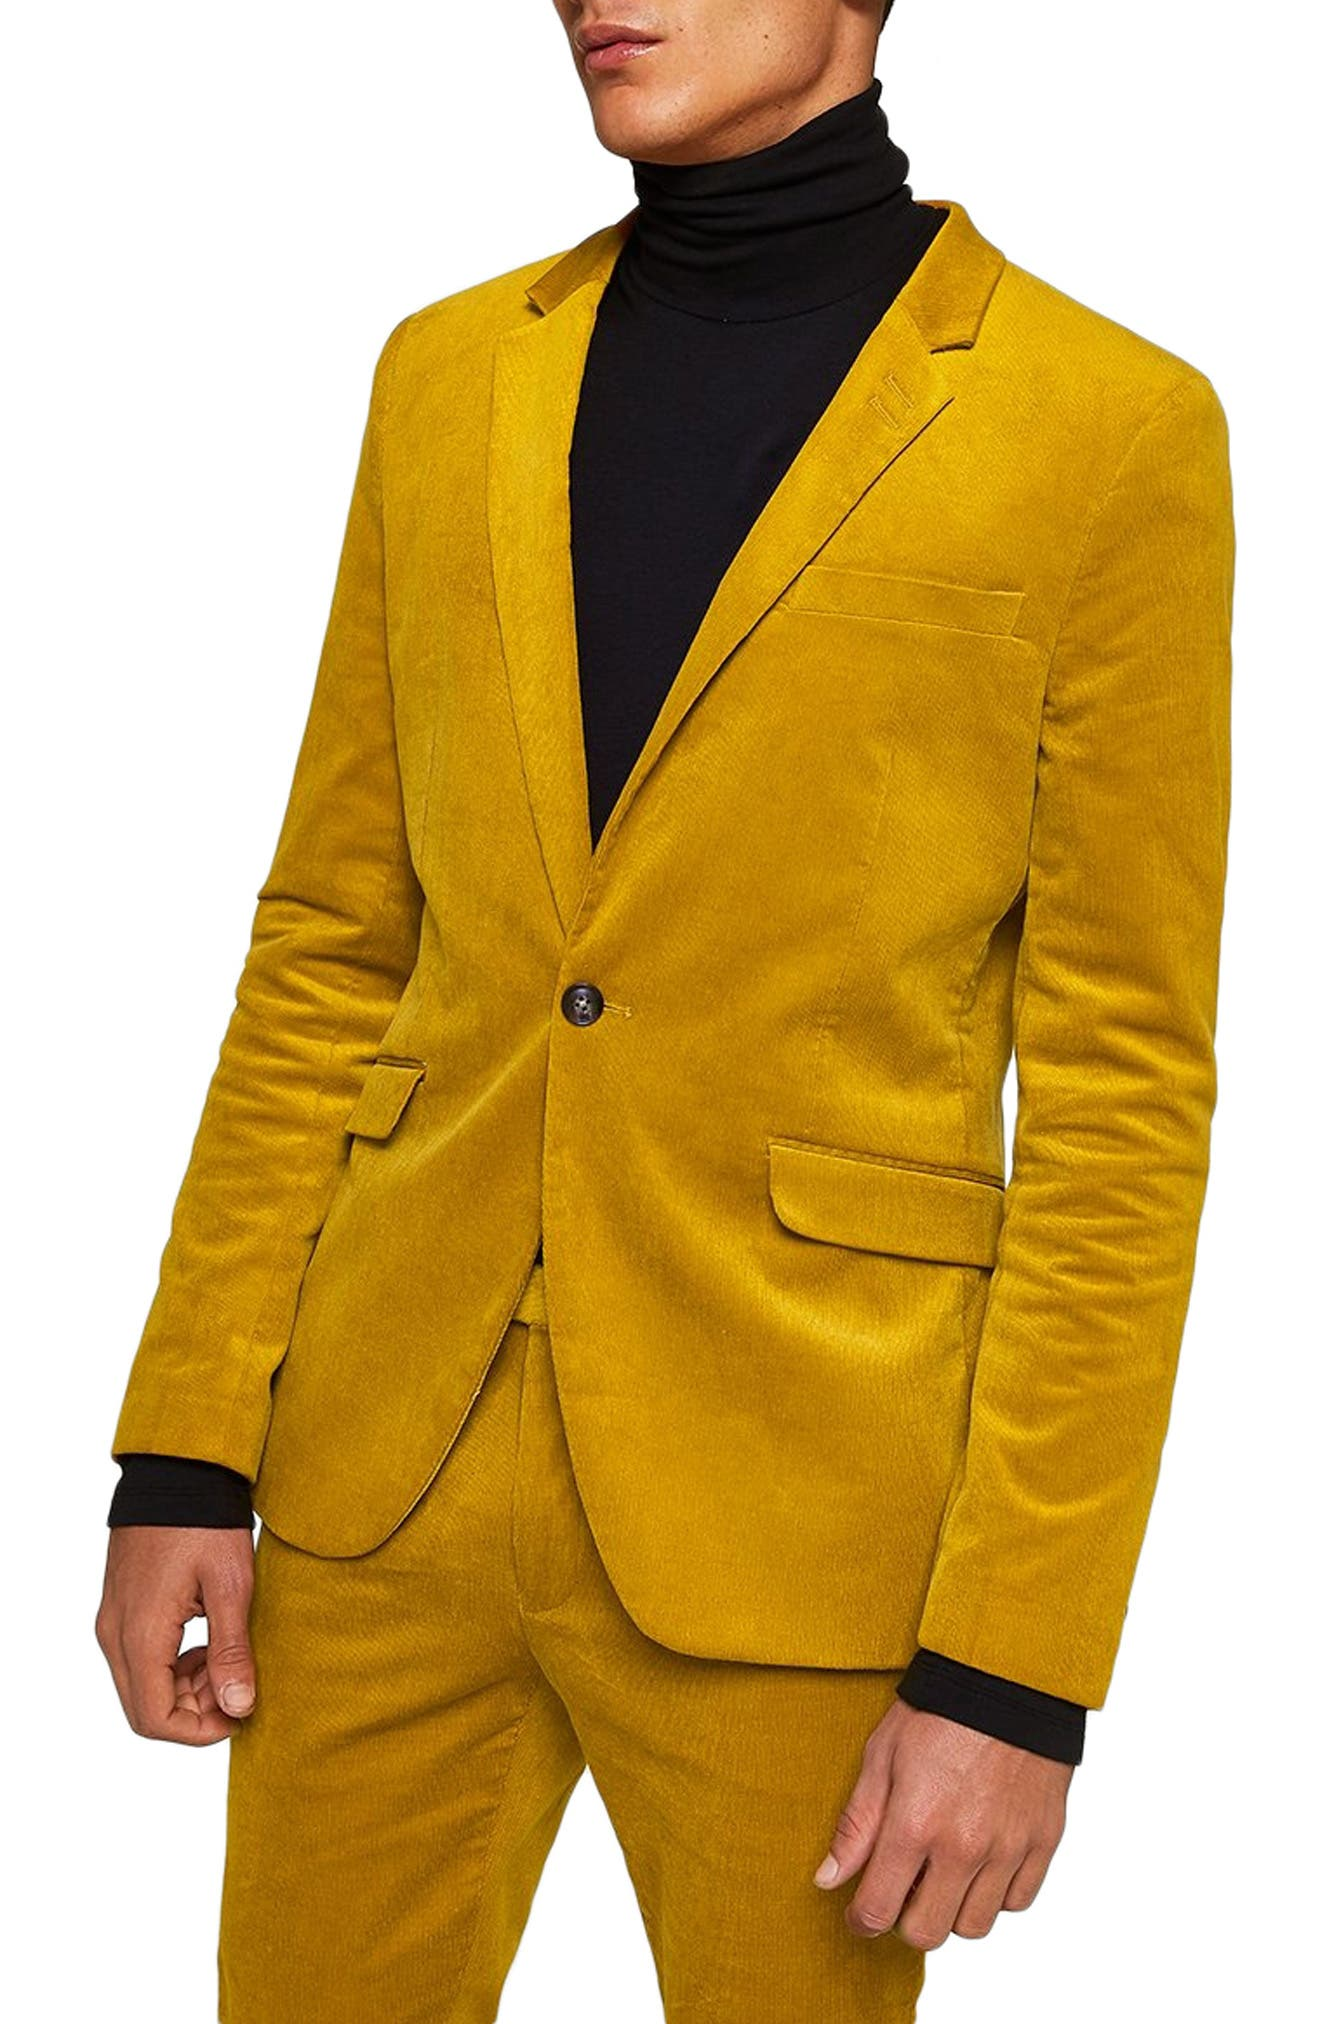 TOPMAN,                             Corduroy Super Skinny Suit Jacket,                             Main thumbnail 1, color,                             700